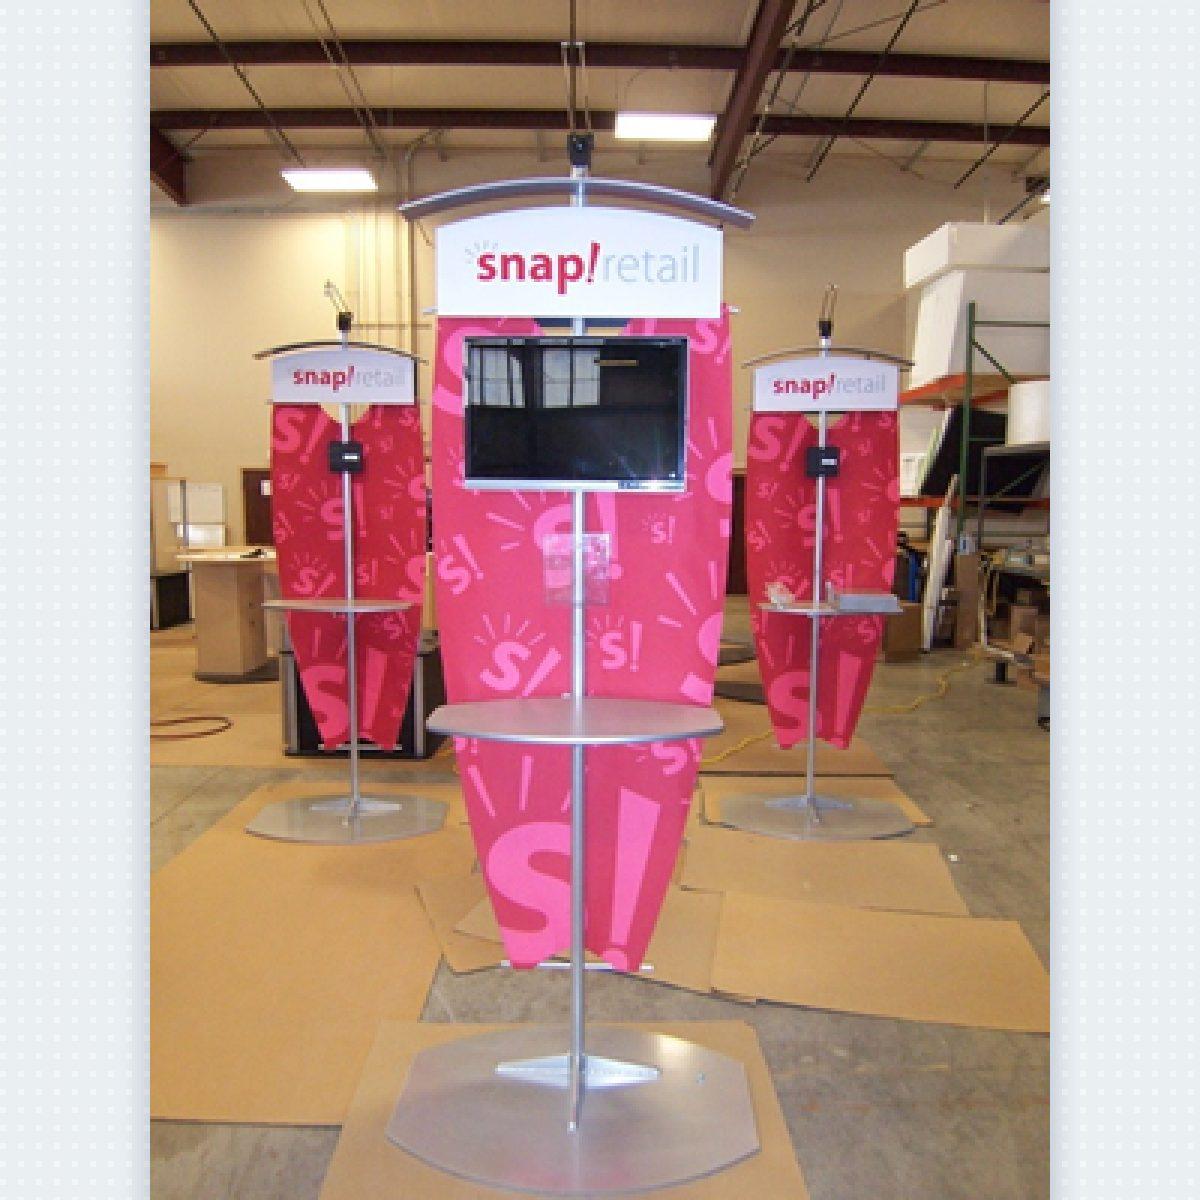 6) Counters & Kiosks